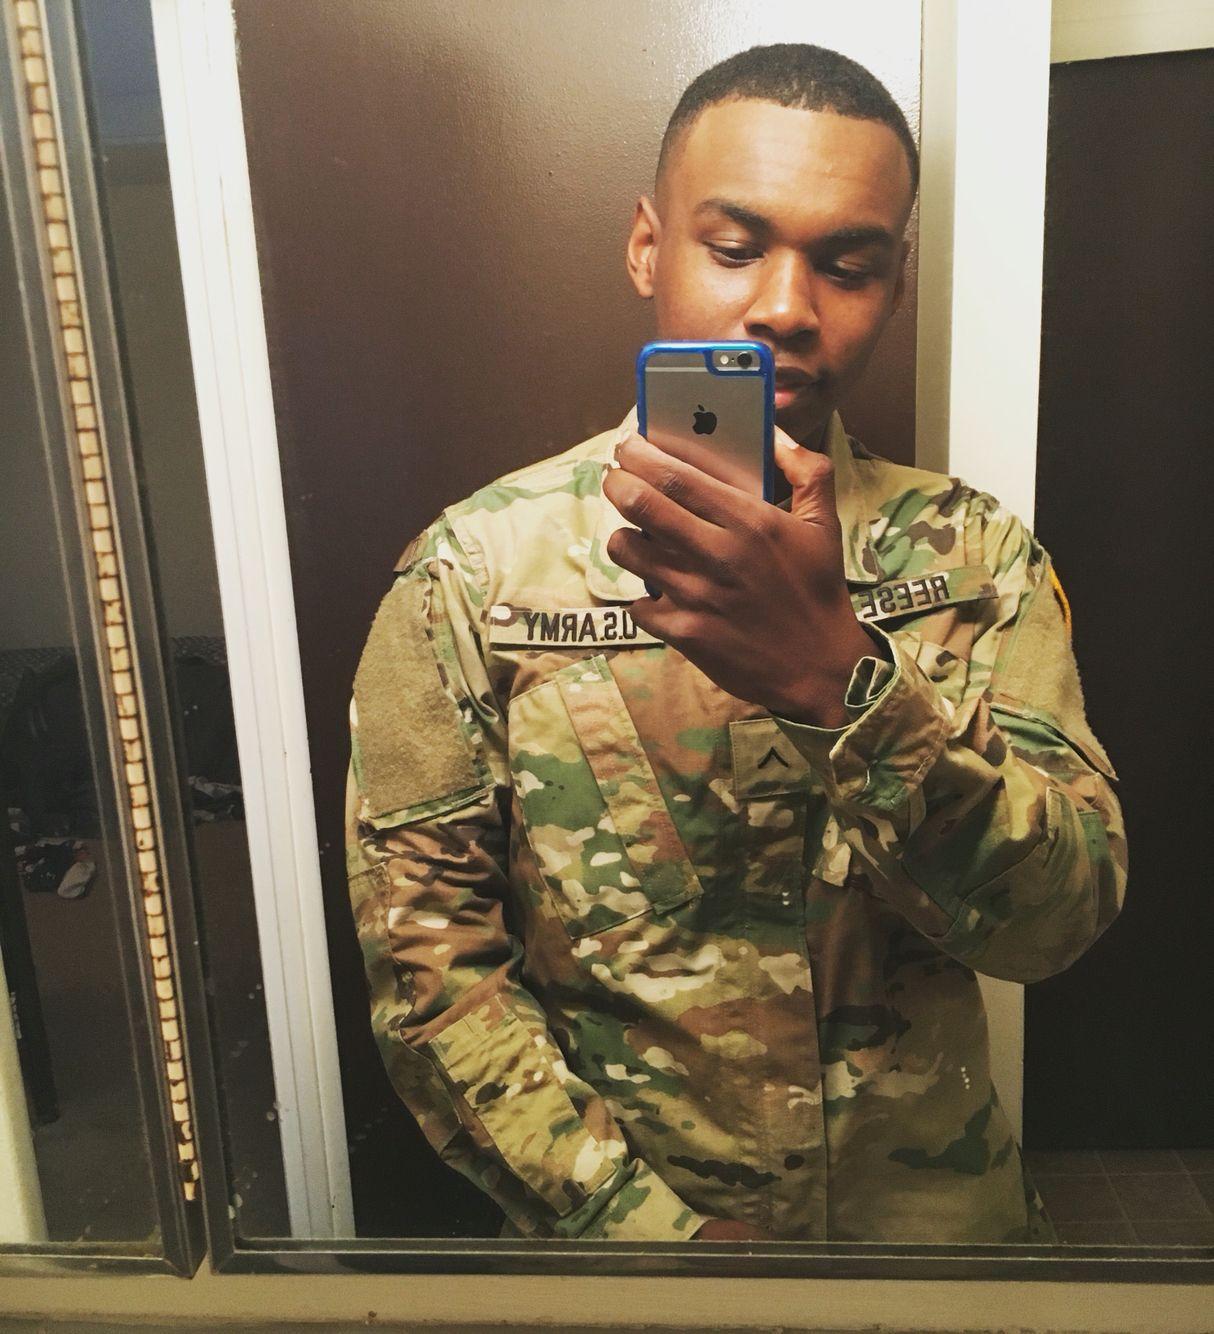 Army OCP uniform U.S. ARMY Pinterest Ocp uniform